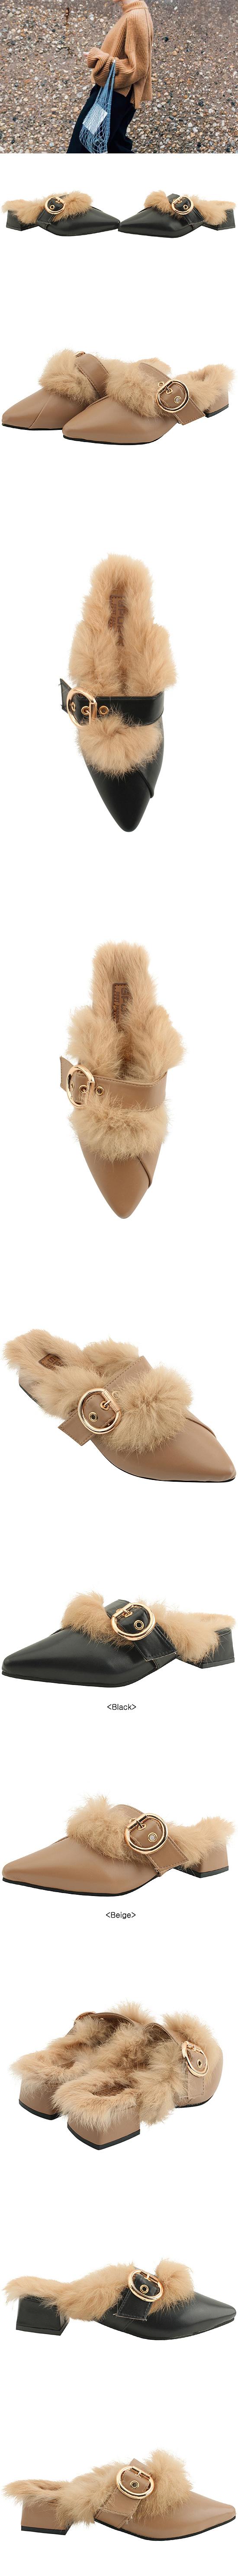 Levit Fur Pointed Nose Mary Jane Blocker Beige